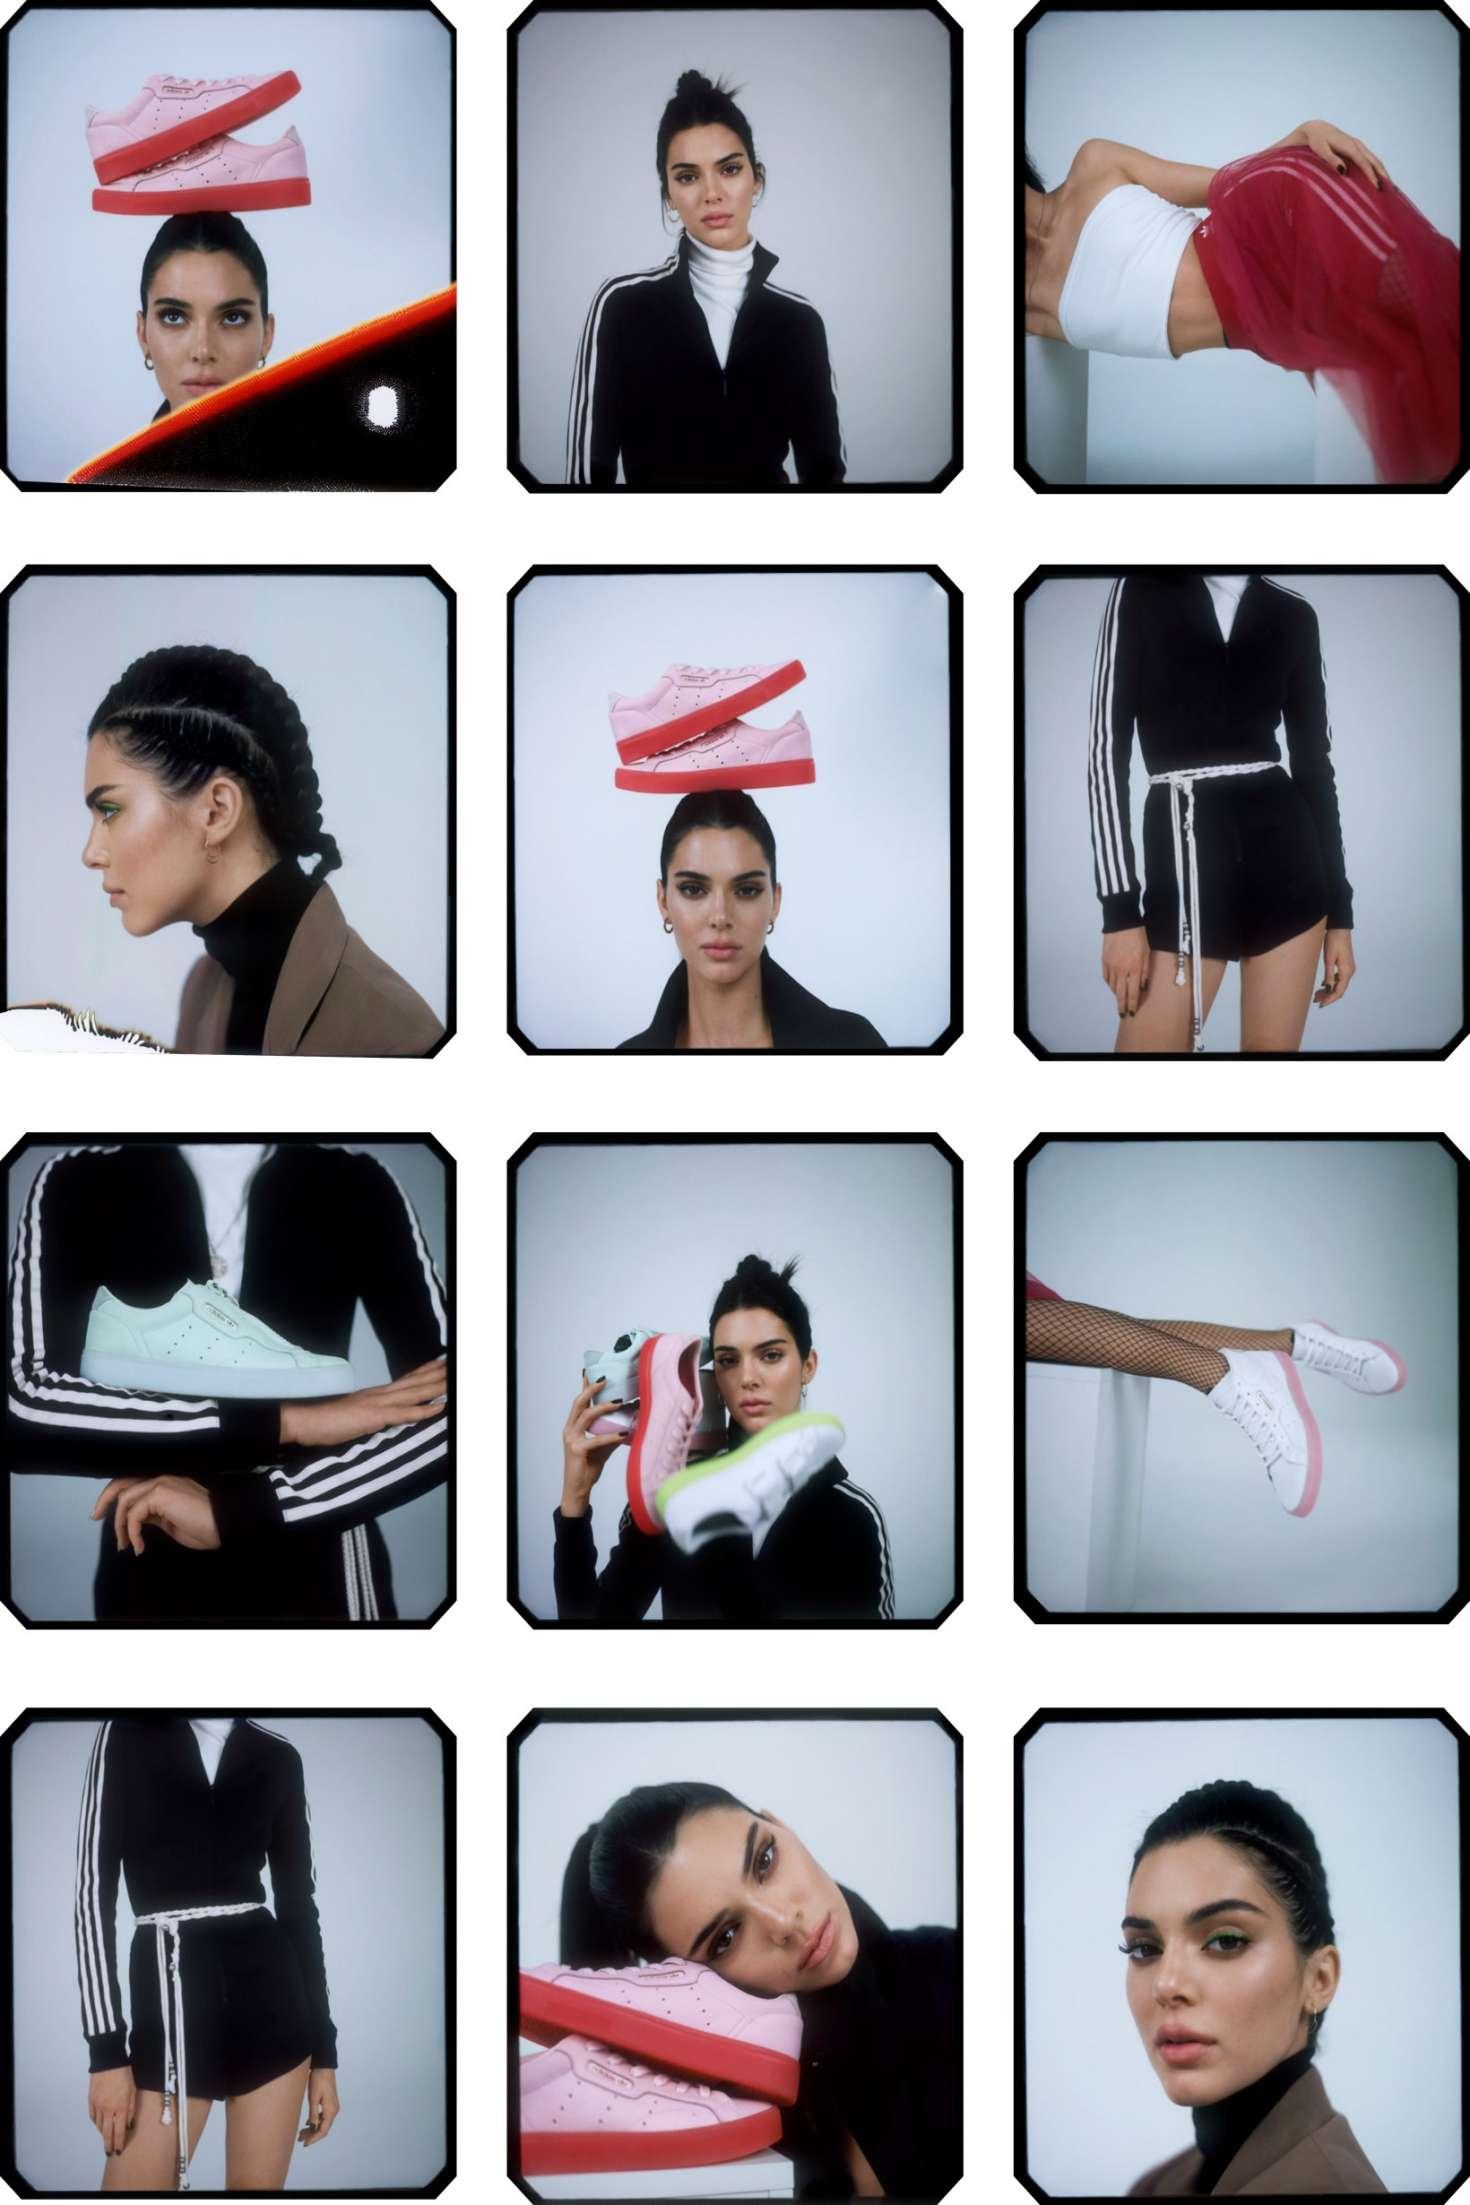 Kendall Jenner 2019 : Kendall Jenner: Adidas New Sleek Lookbook 2019 Collection -11